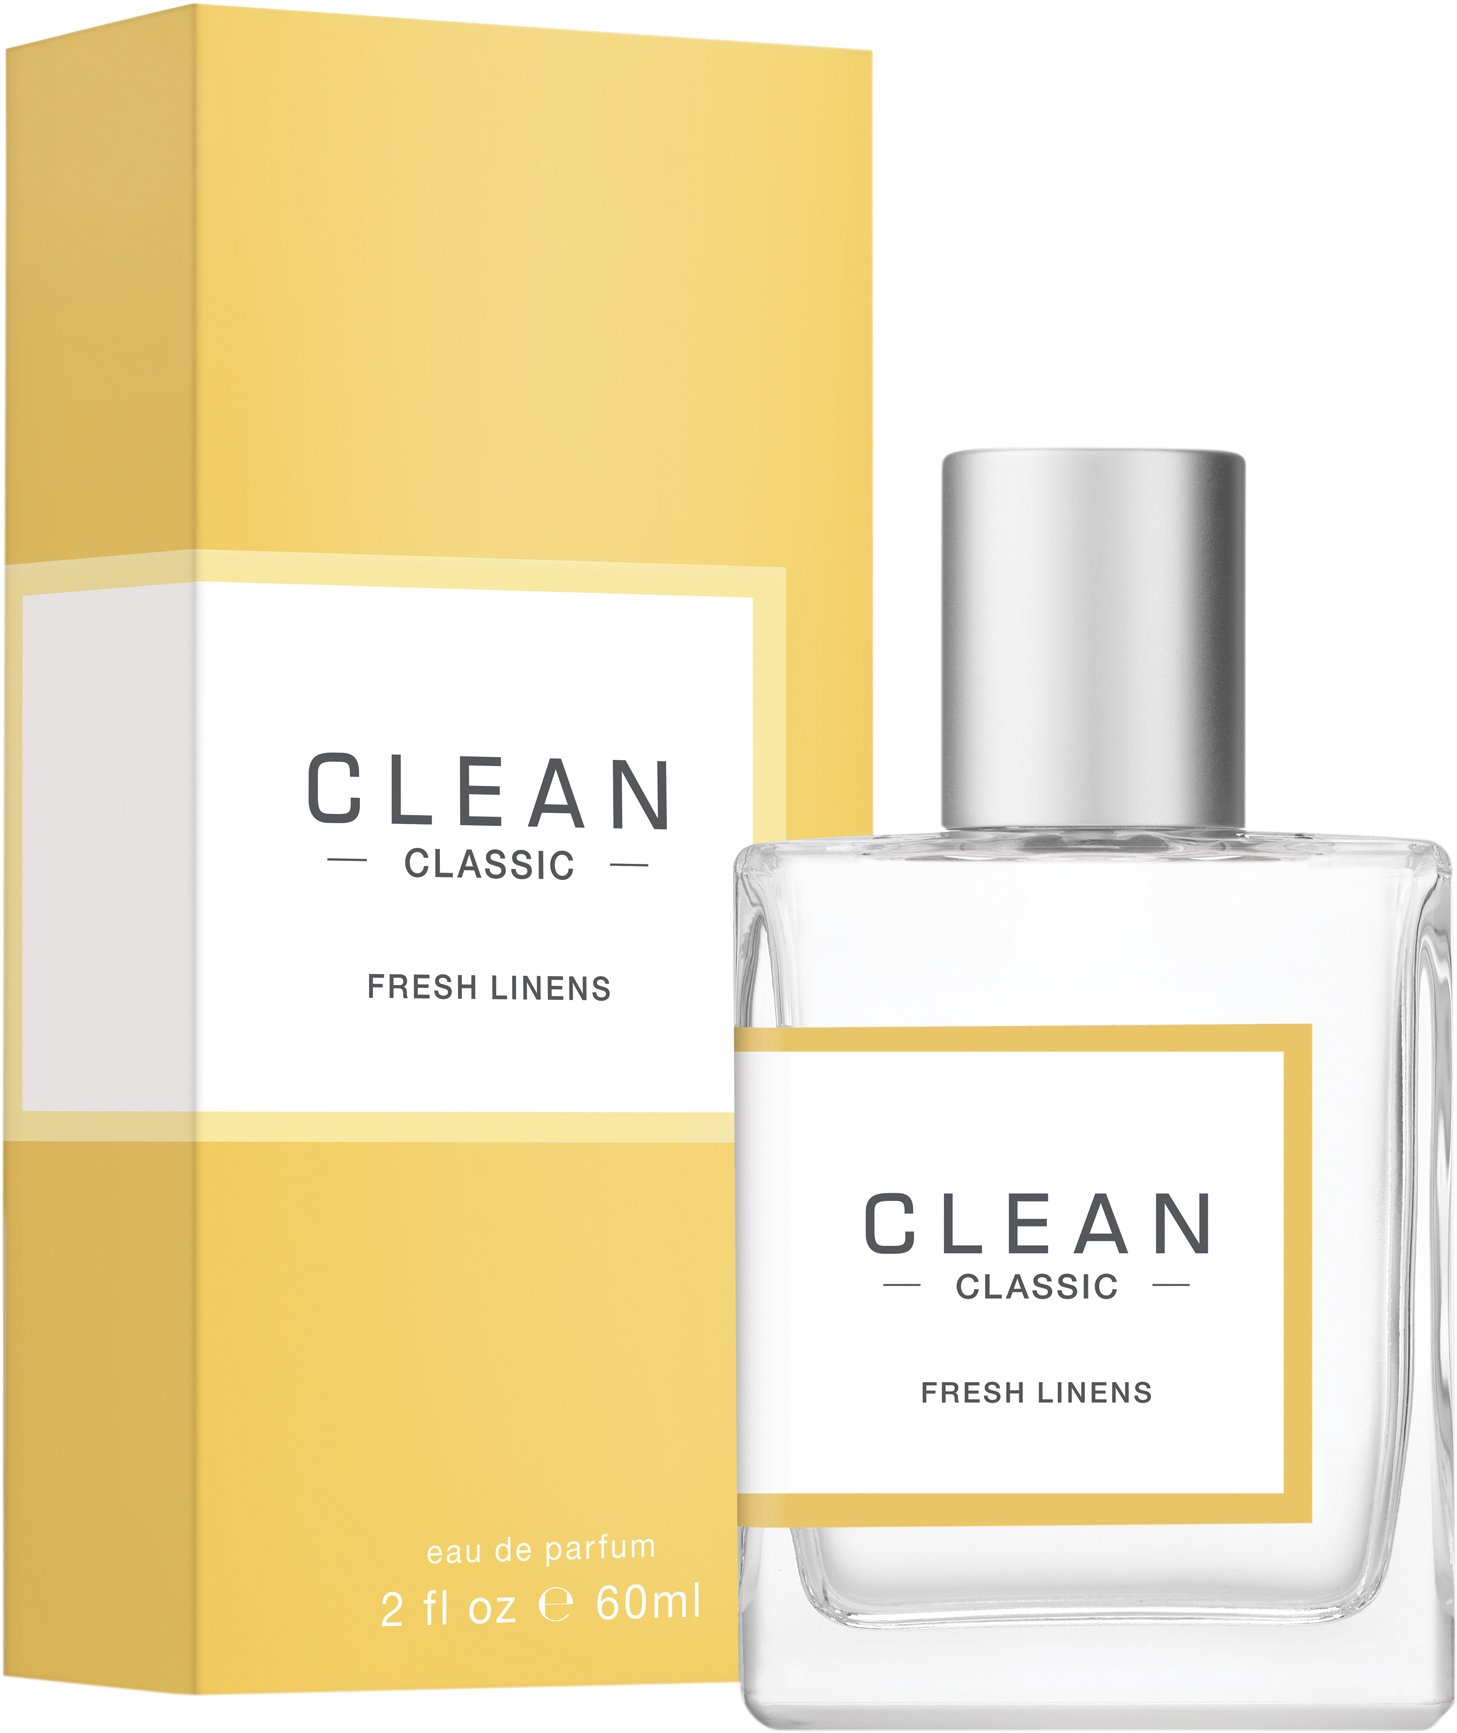 CLEAN PERFUME Fresh Linens Eau de Parfum